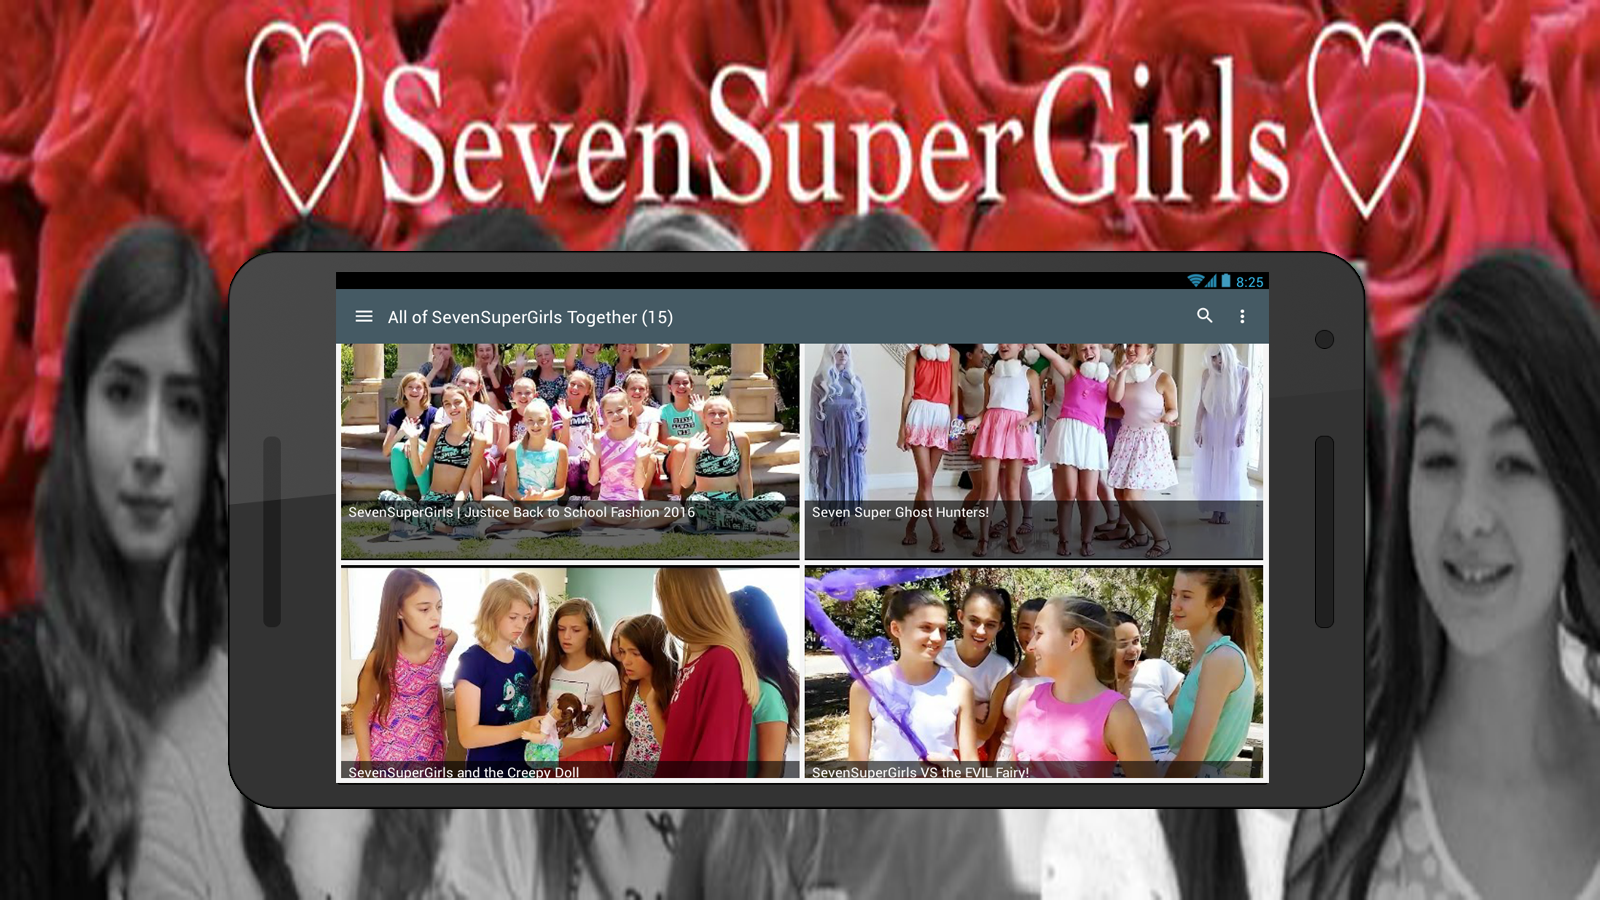 Kaelyn from ssg phone number - Seven Super Girls Screenshot